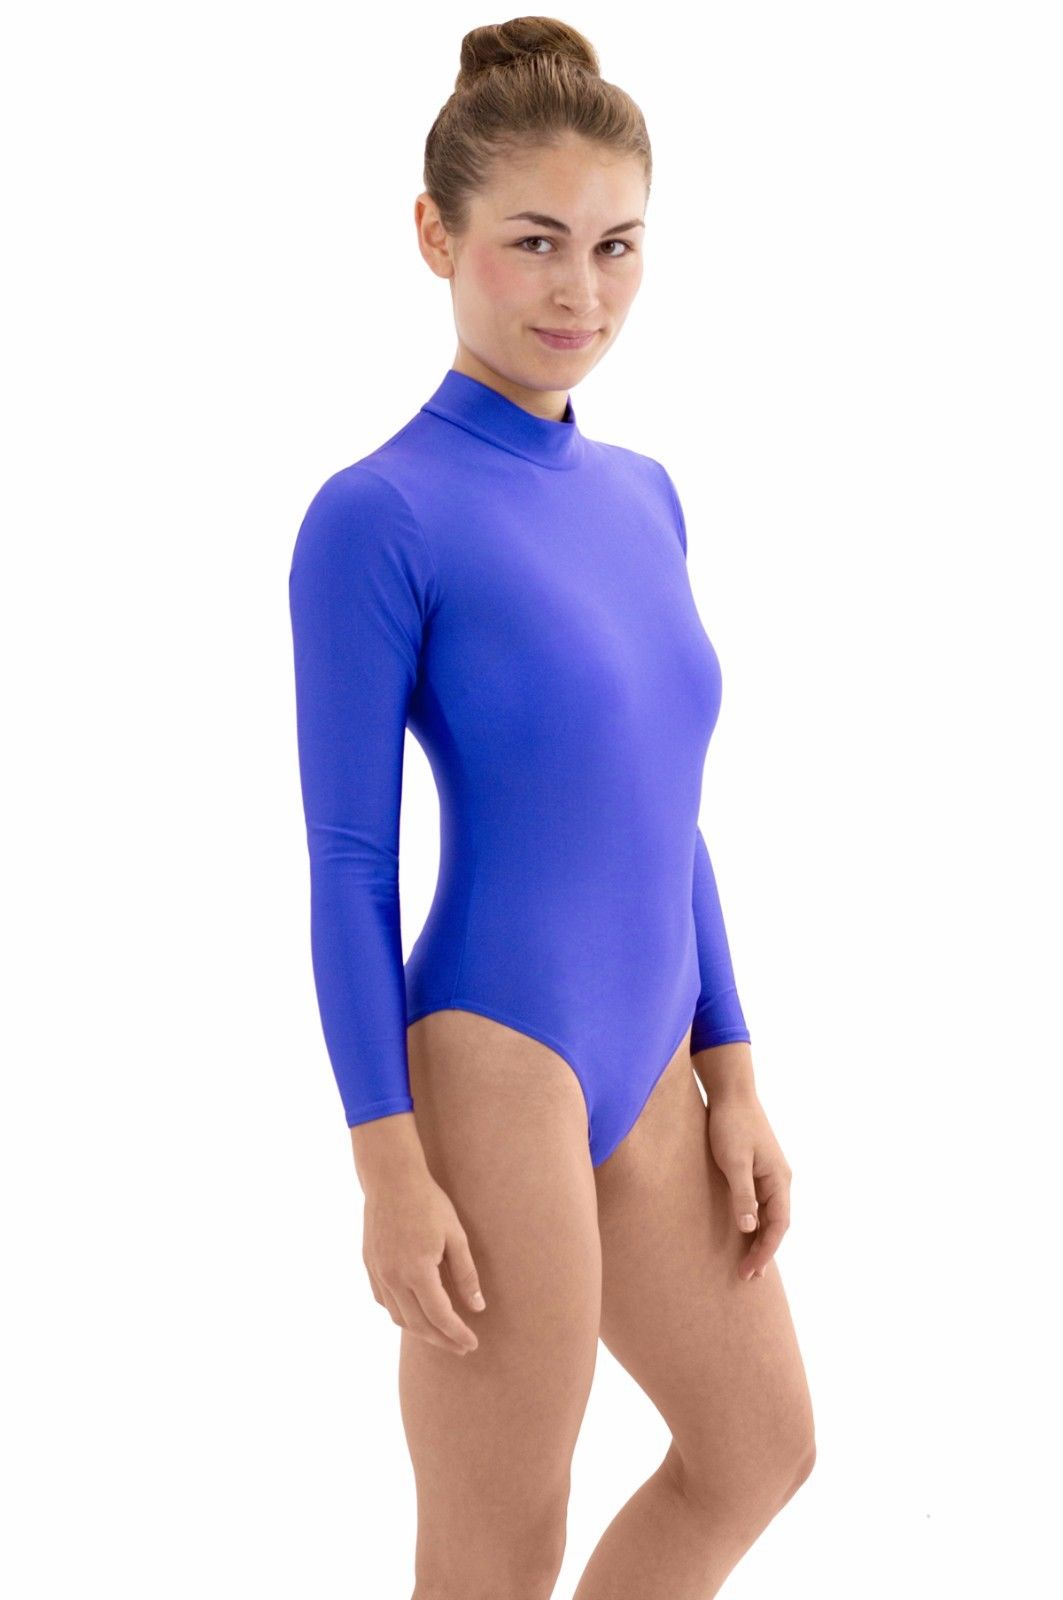 Gymnastikbody Damen Rückenreißvers. lange Ärmel große Farbauswahl Größen S-XXL